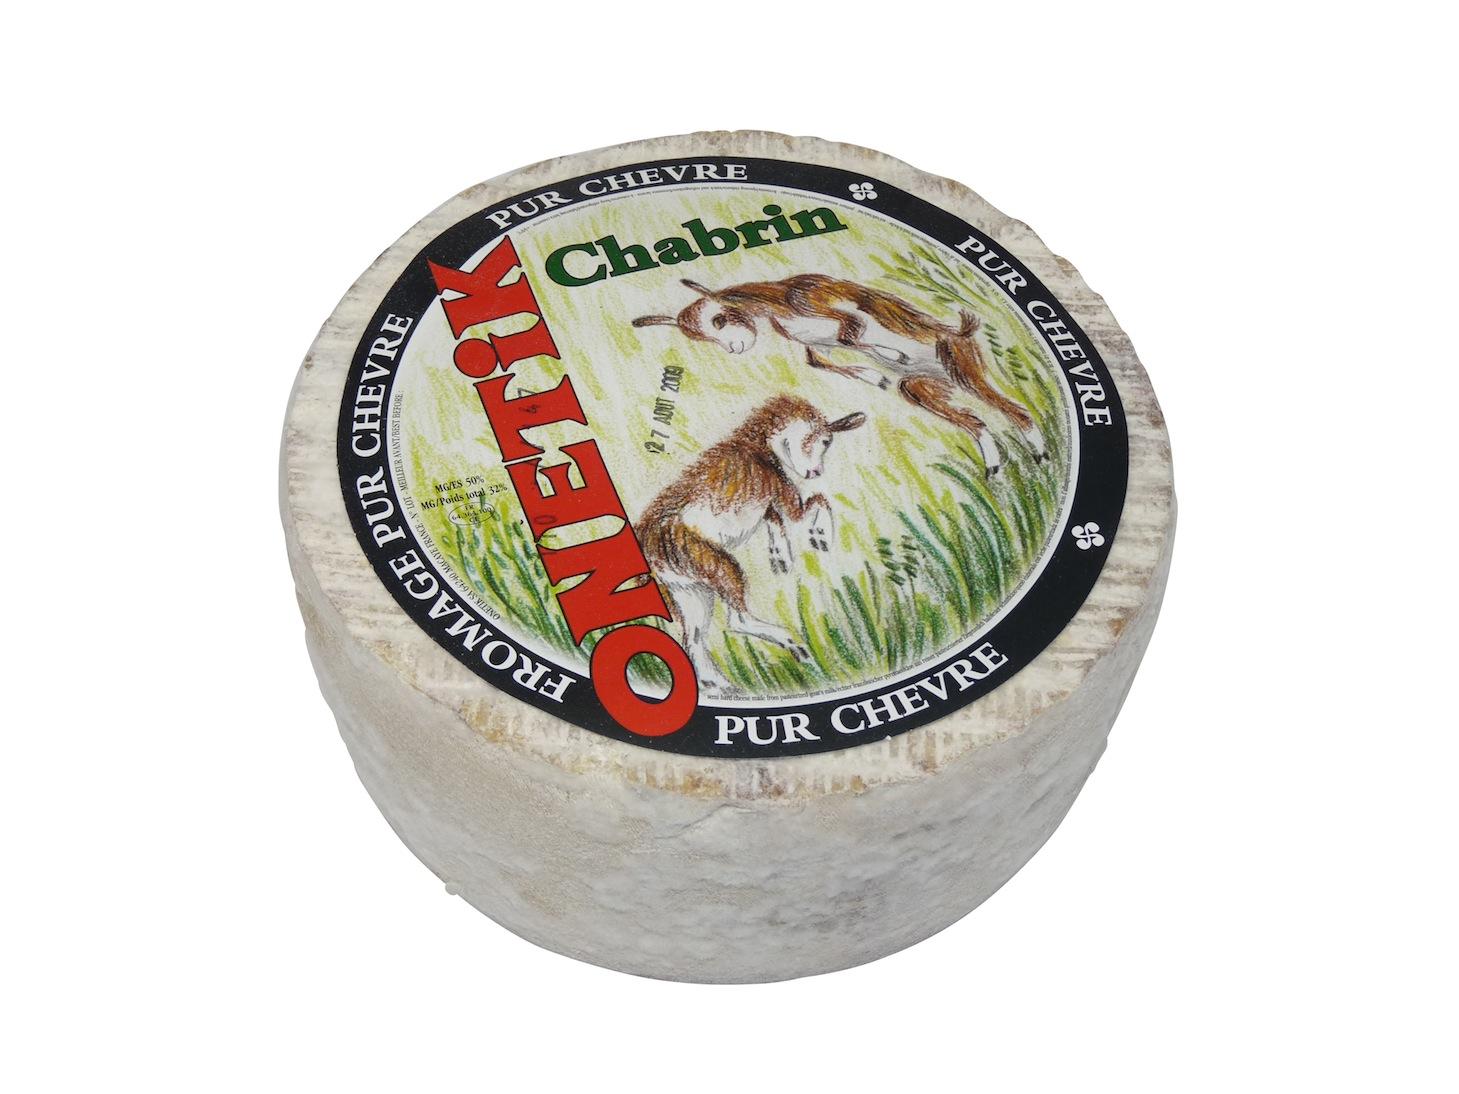 Pyreneeën Chèvre Chabrin